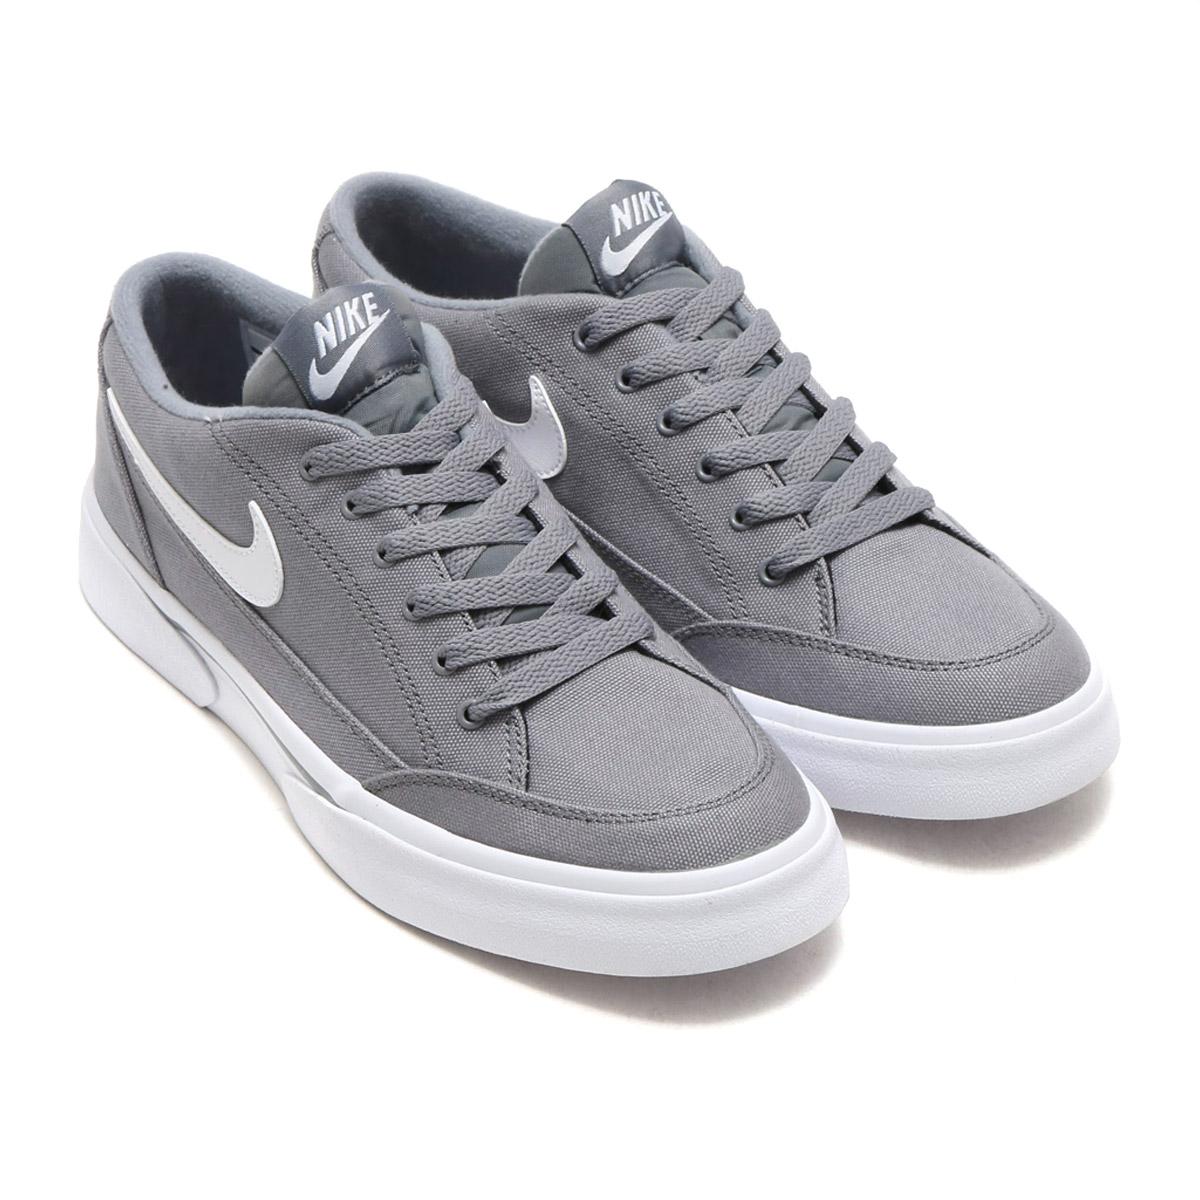 designer fashion 529e2 36a5a NIKE GTS   16 TXT (Nike GTS 16 TXT) (COOL GREY WHITE) 17 SP-I